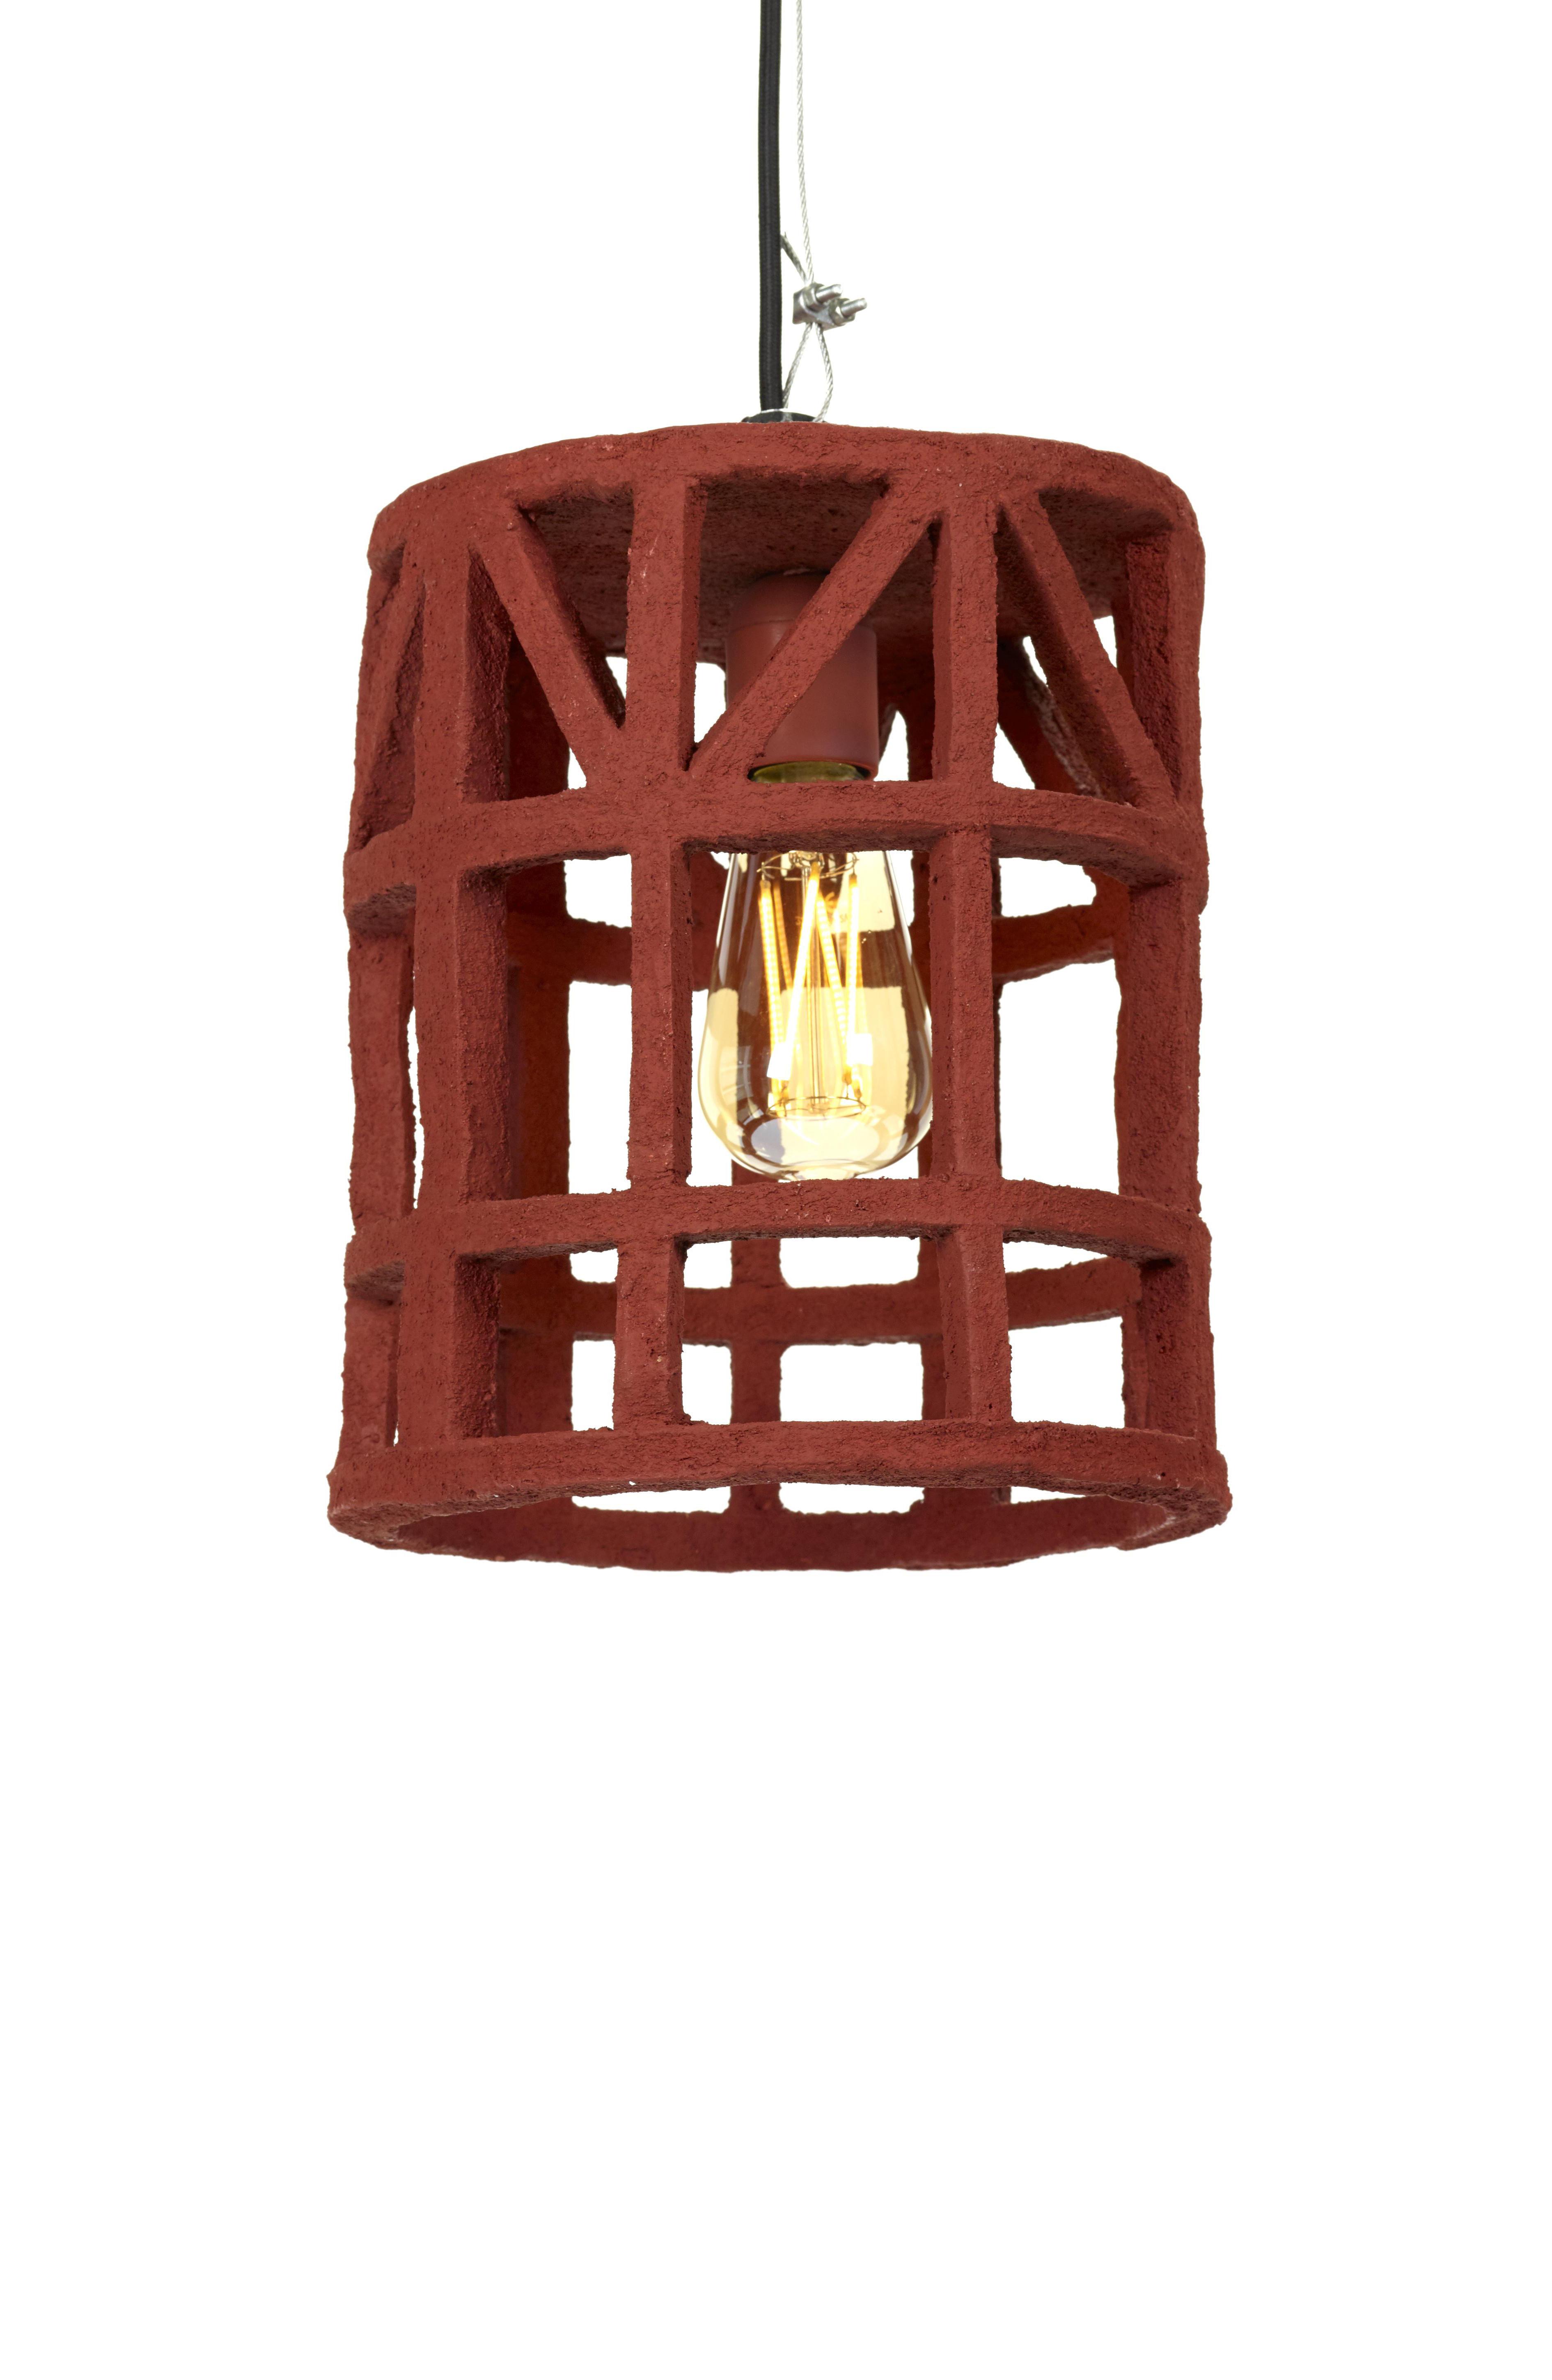 Lighting - Pendant Lighting - Marie Pendant - / Papier recyclé - Taille S by Serax - Rouge / Taille S - Recycled papier-mâché